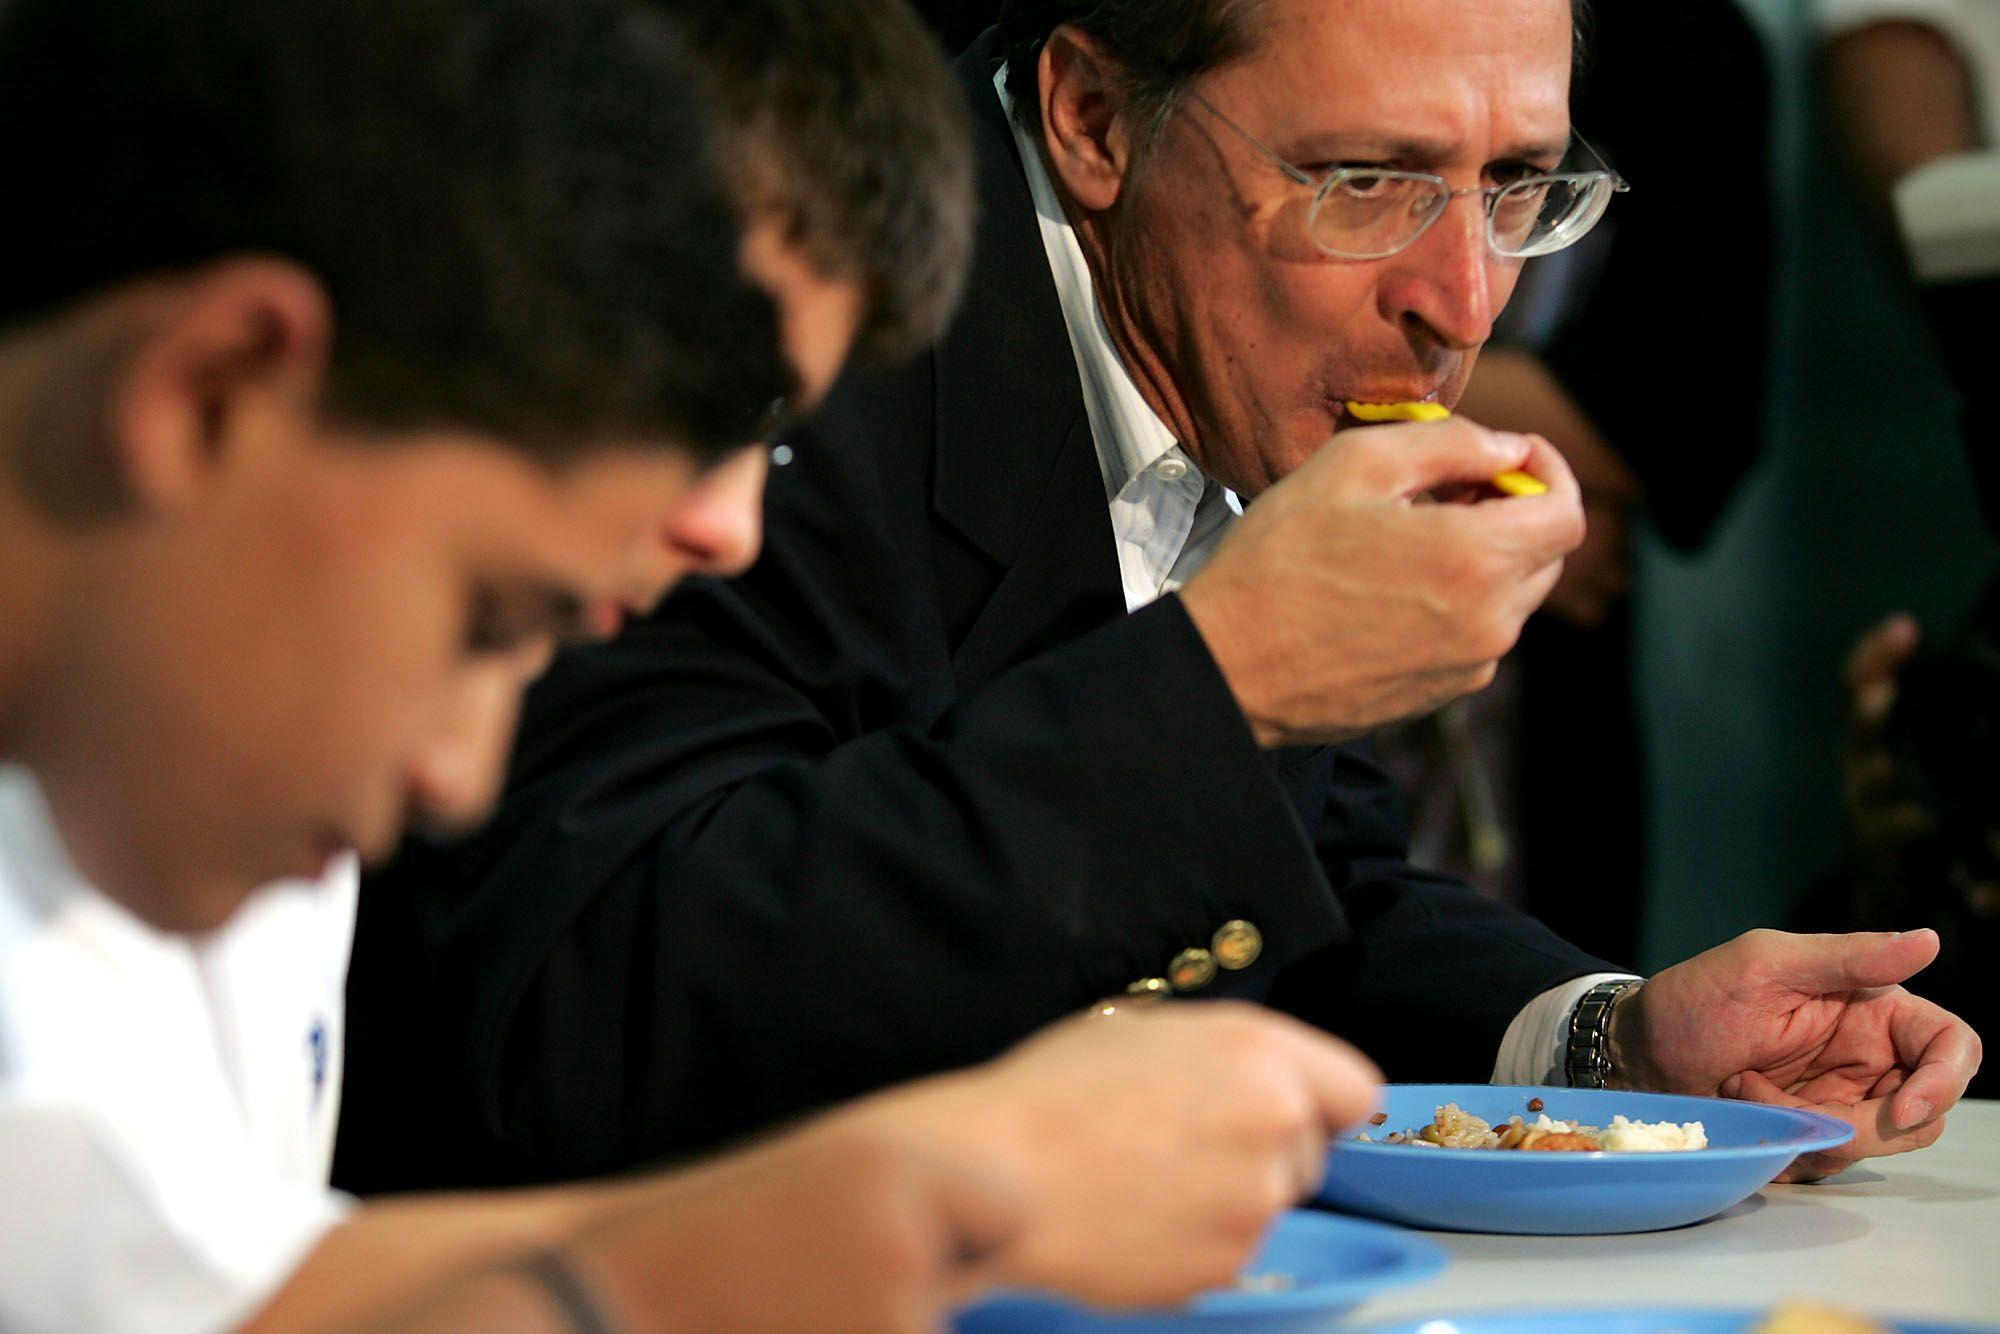 Alckmin sinaliza que vai voltar a servir carne na merenda nas escolas